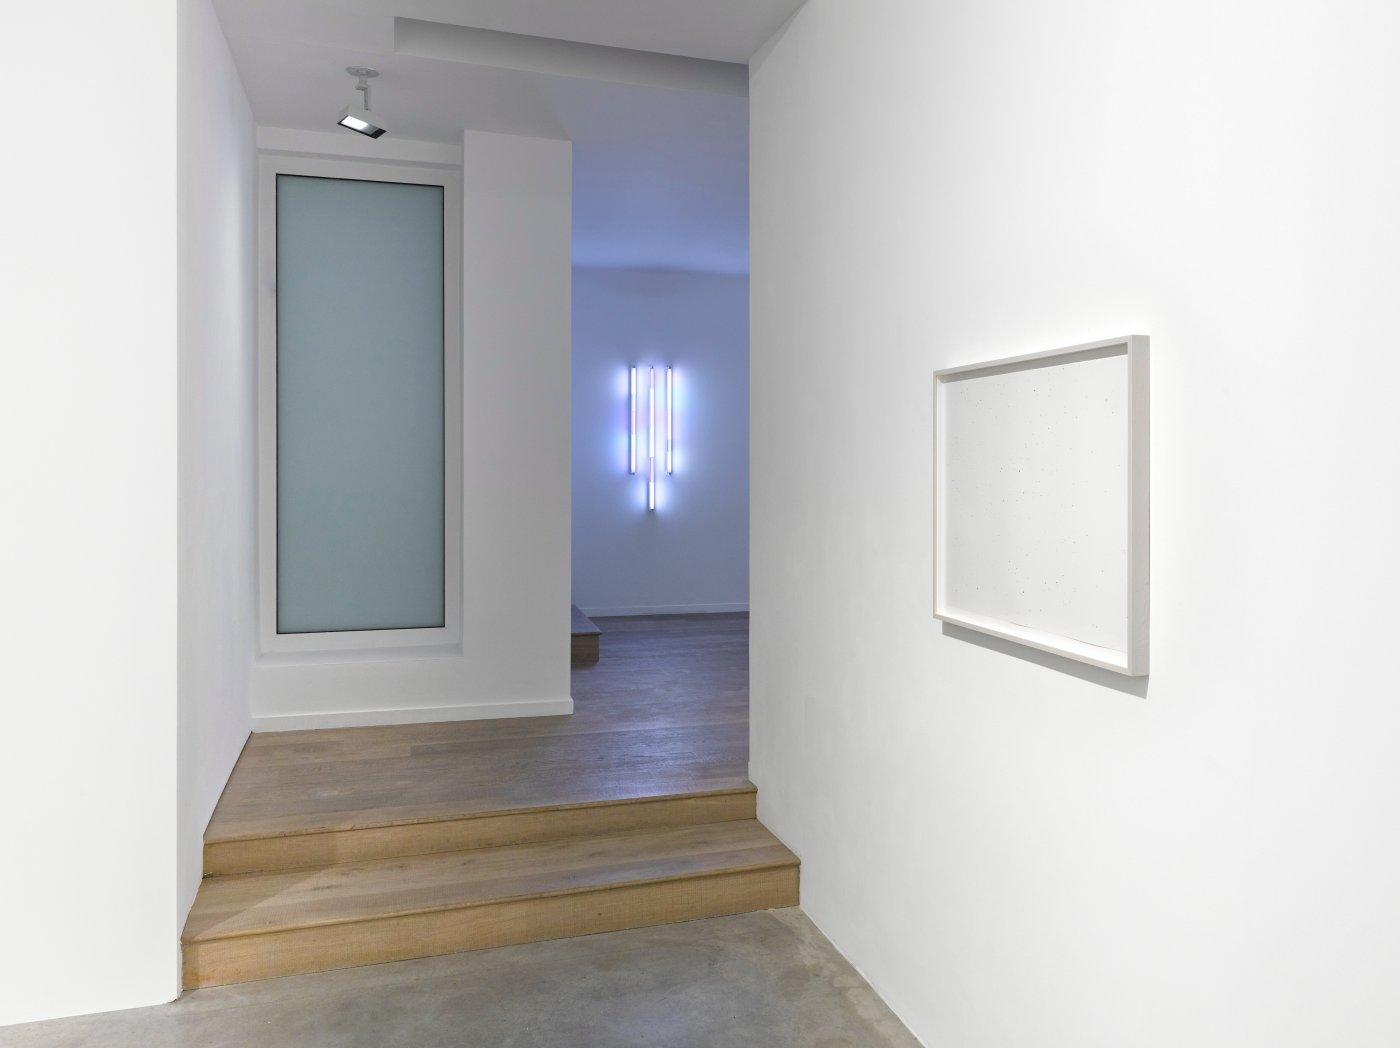 Lisson Gallery Bell Street Spencer Finch 8